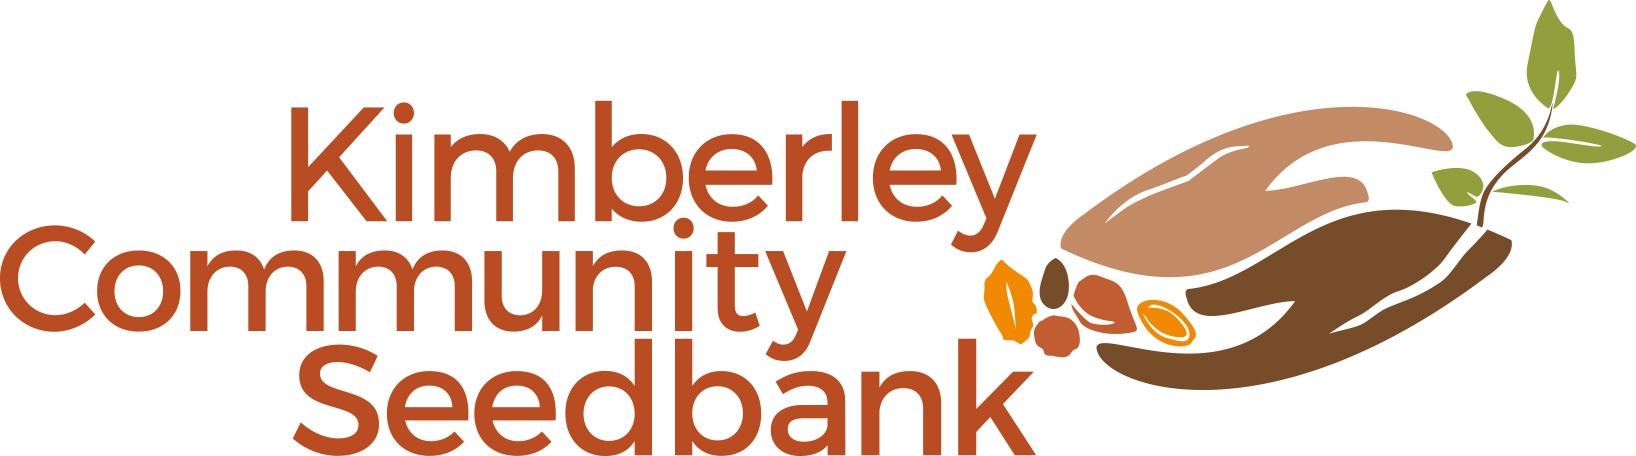 seedbank-logo.jpg